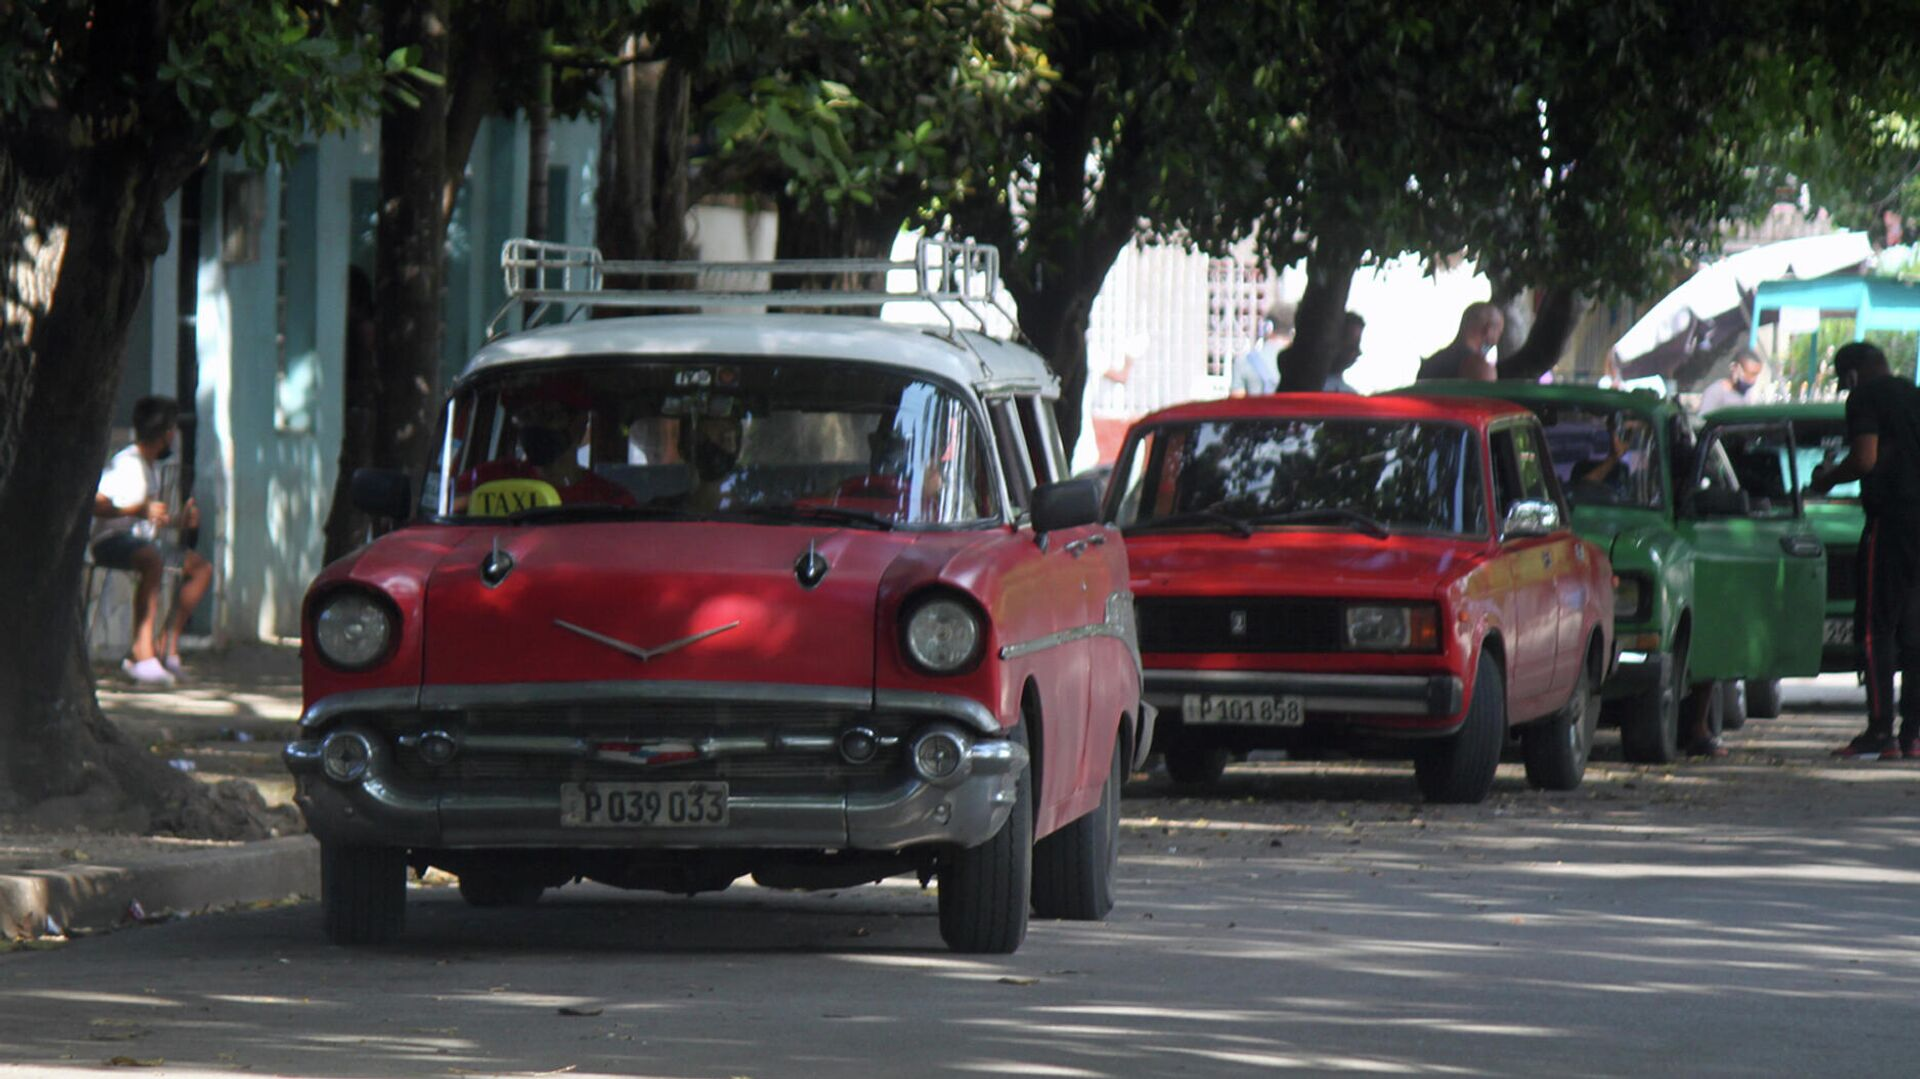 Autos de fabricación estadounidense con más de 65 años de explotación que aun circulan por las calles de Cuba - Sputnik Mundo, 1920, 04.10.2021